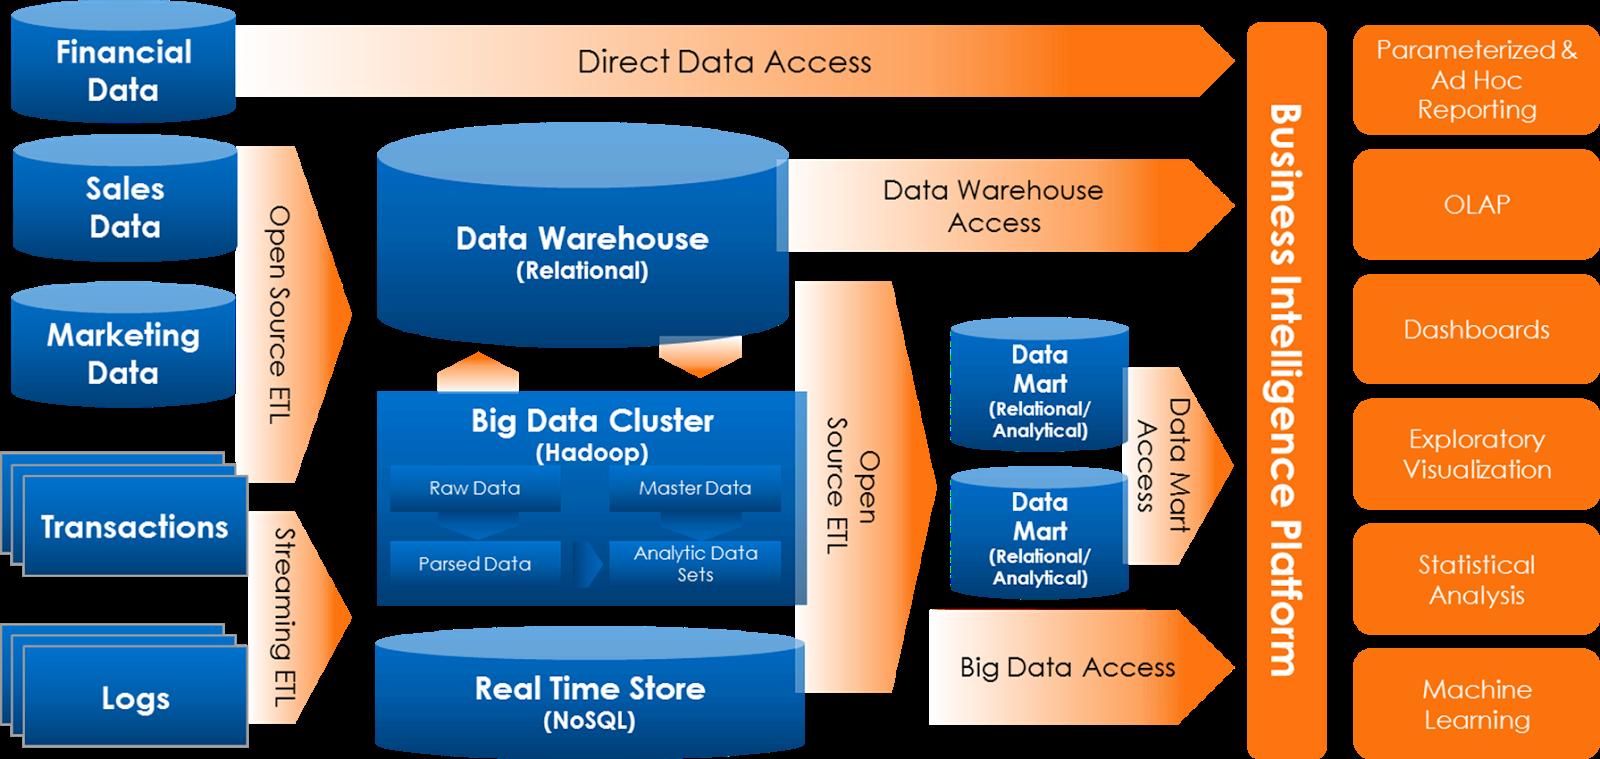 Data warehouse and data mart